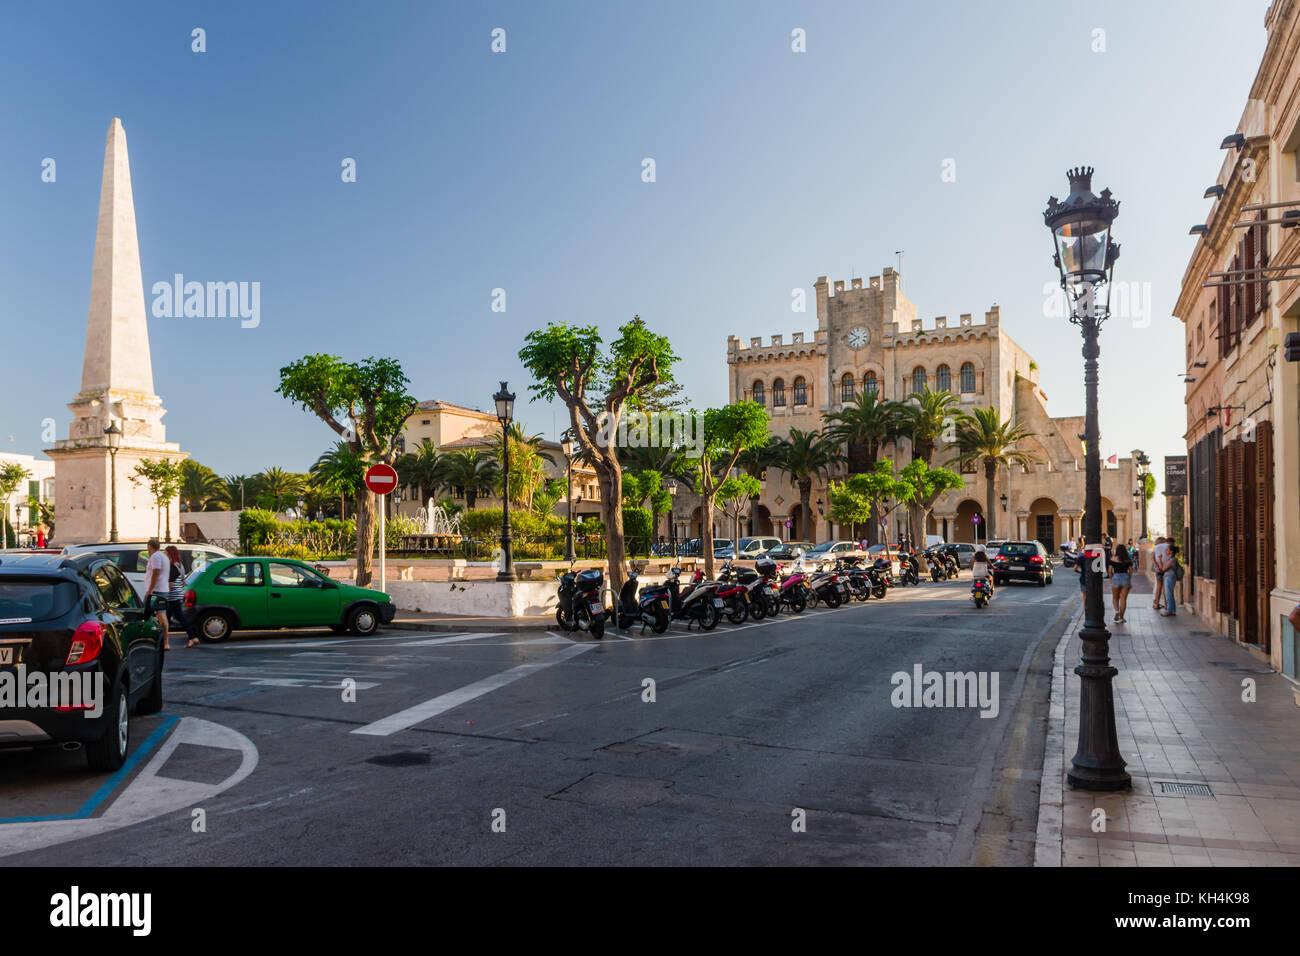 Town hall and Obelish in main square of Ciutadella, Menorca - Stock Image